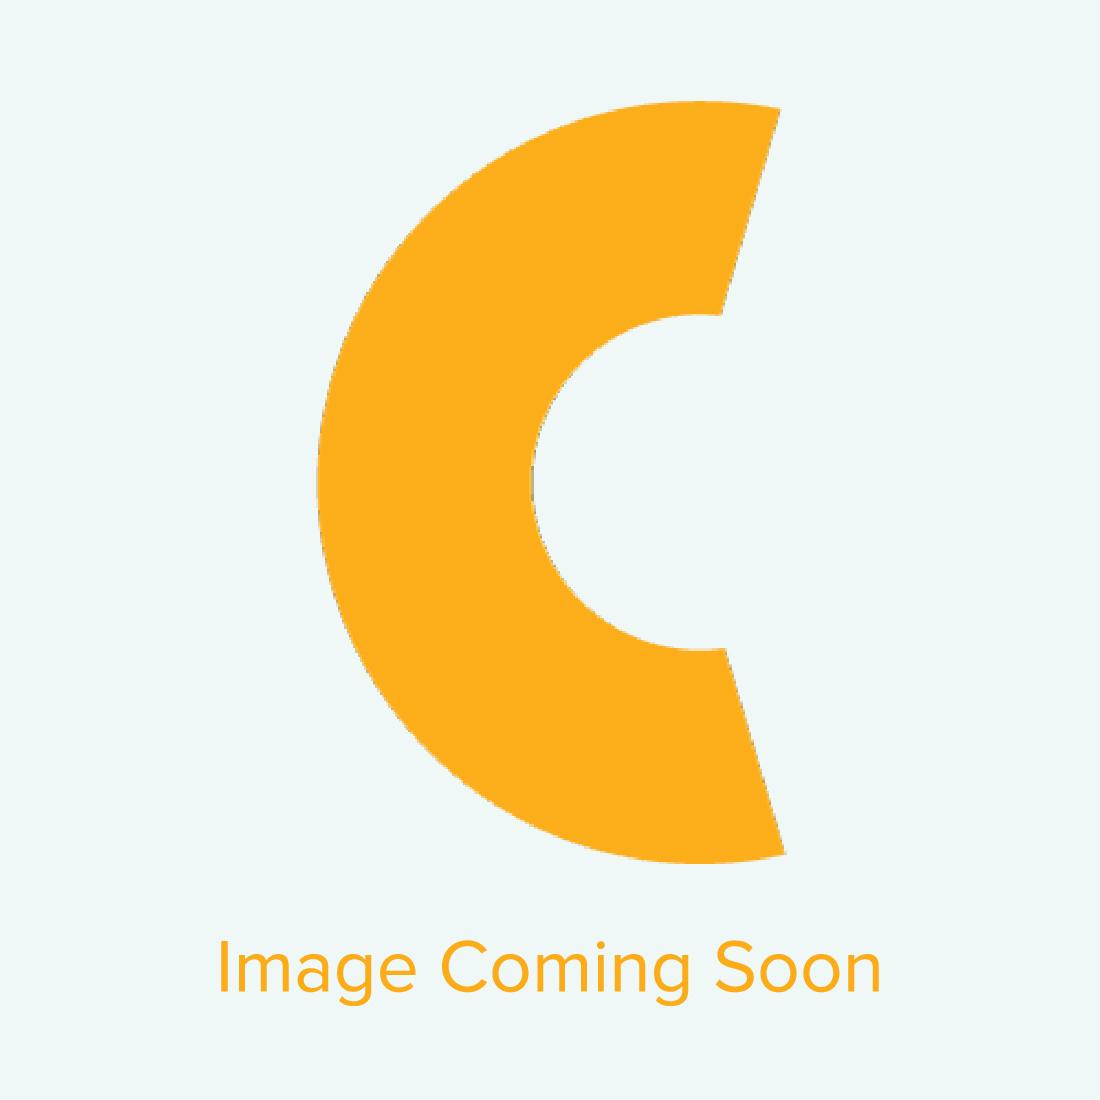 OKI Data C711WT Replacement Transfer Belt